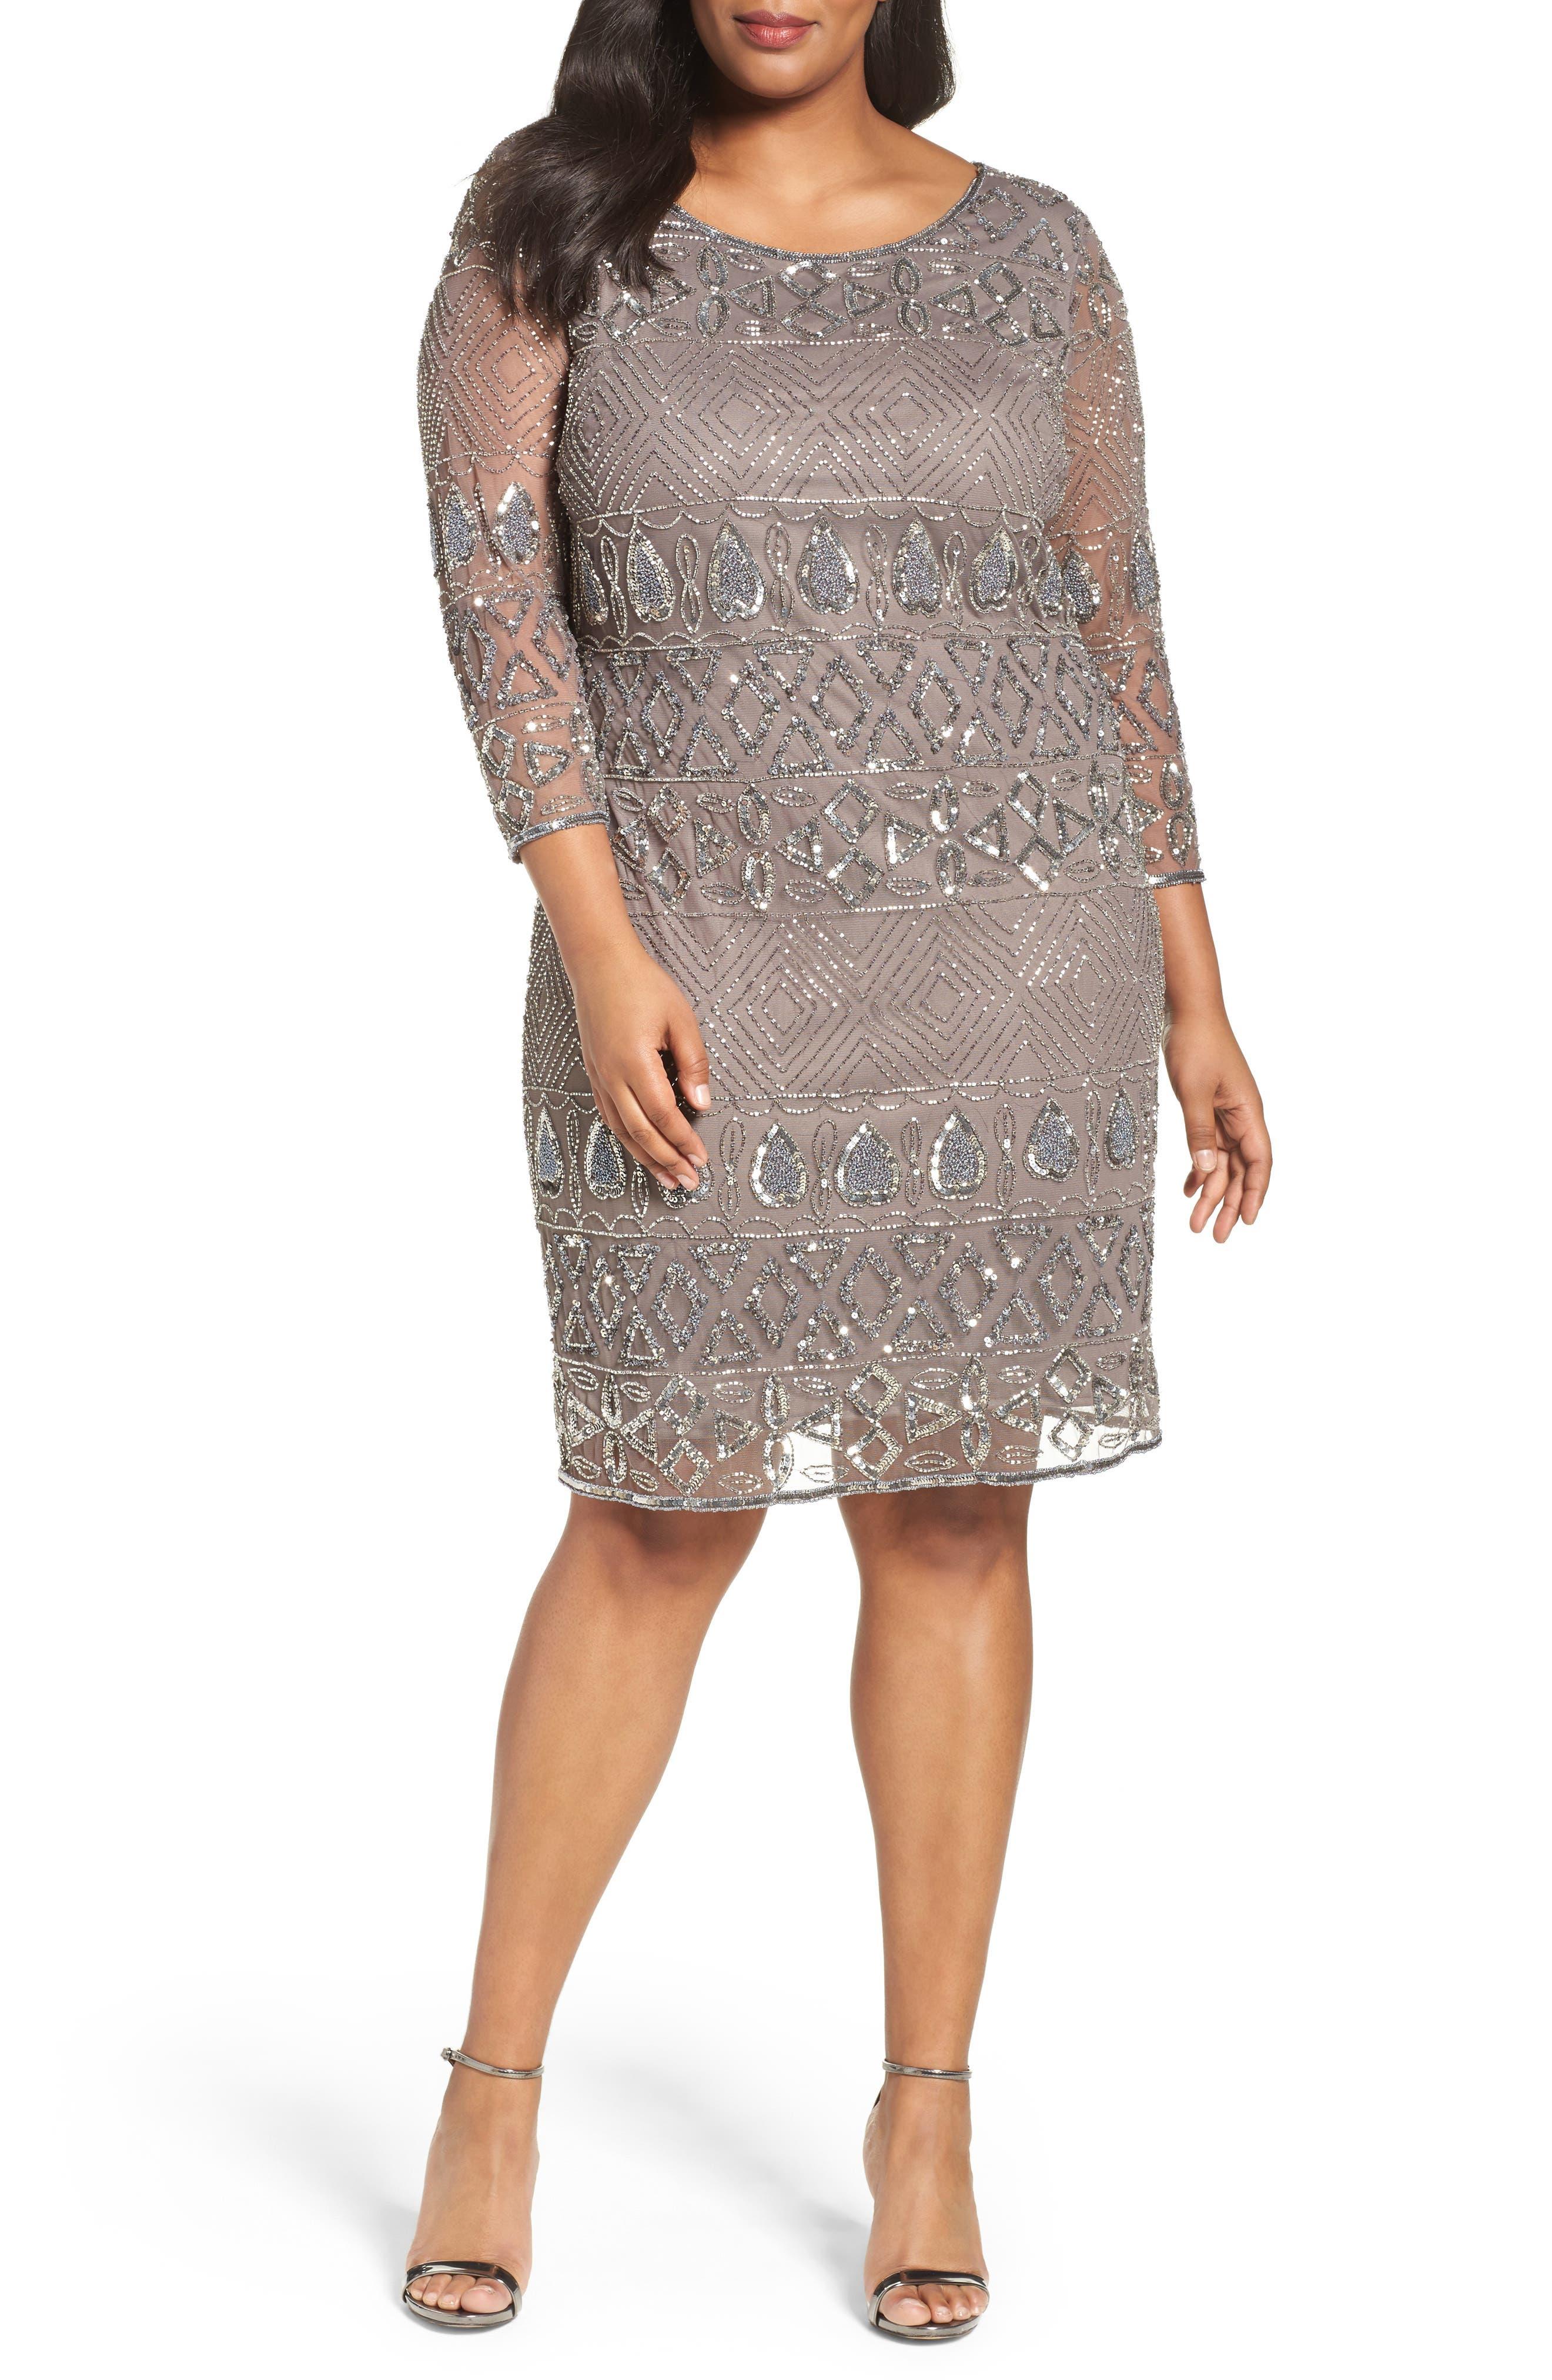 Pisarro Nights Heart Motif Embellished Sheath Dress (Plus Size)